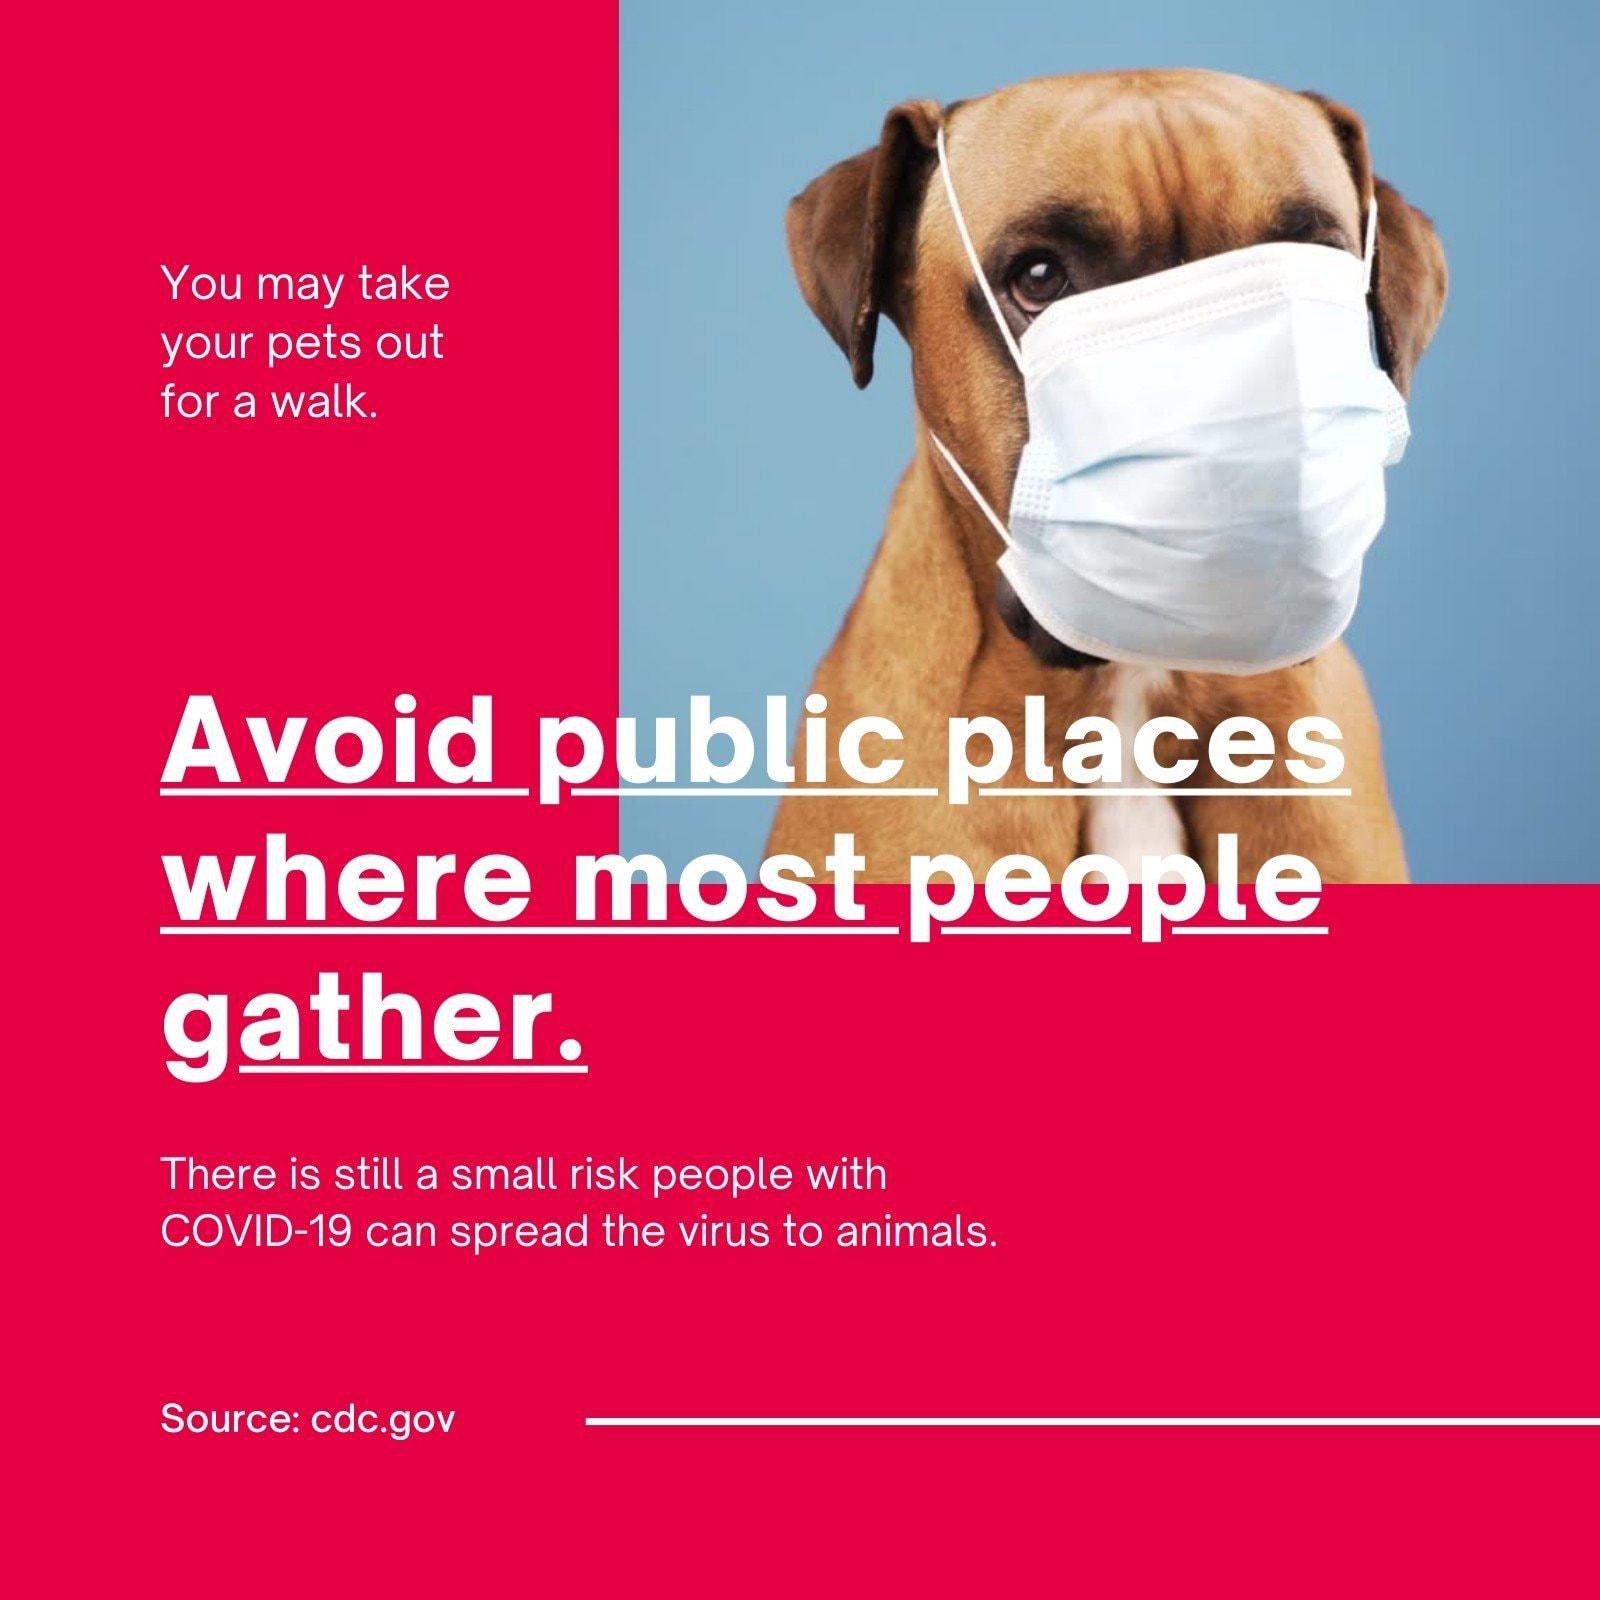 Red Geometric Info Pet Care Coronavirus Social Media Post